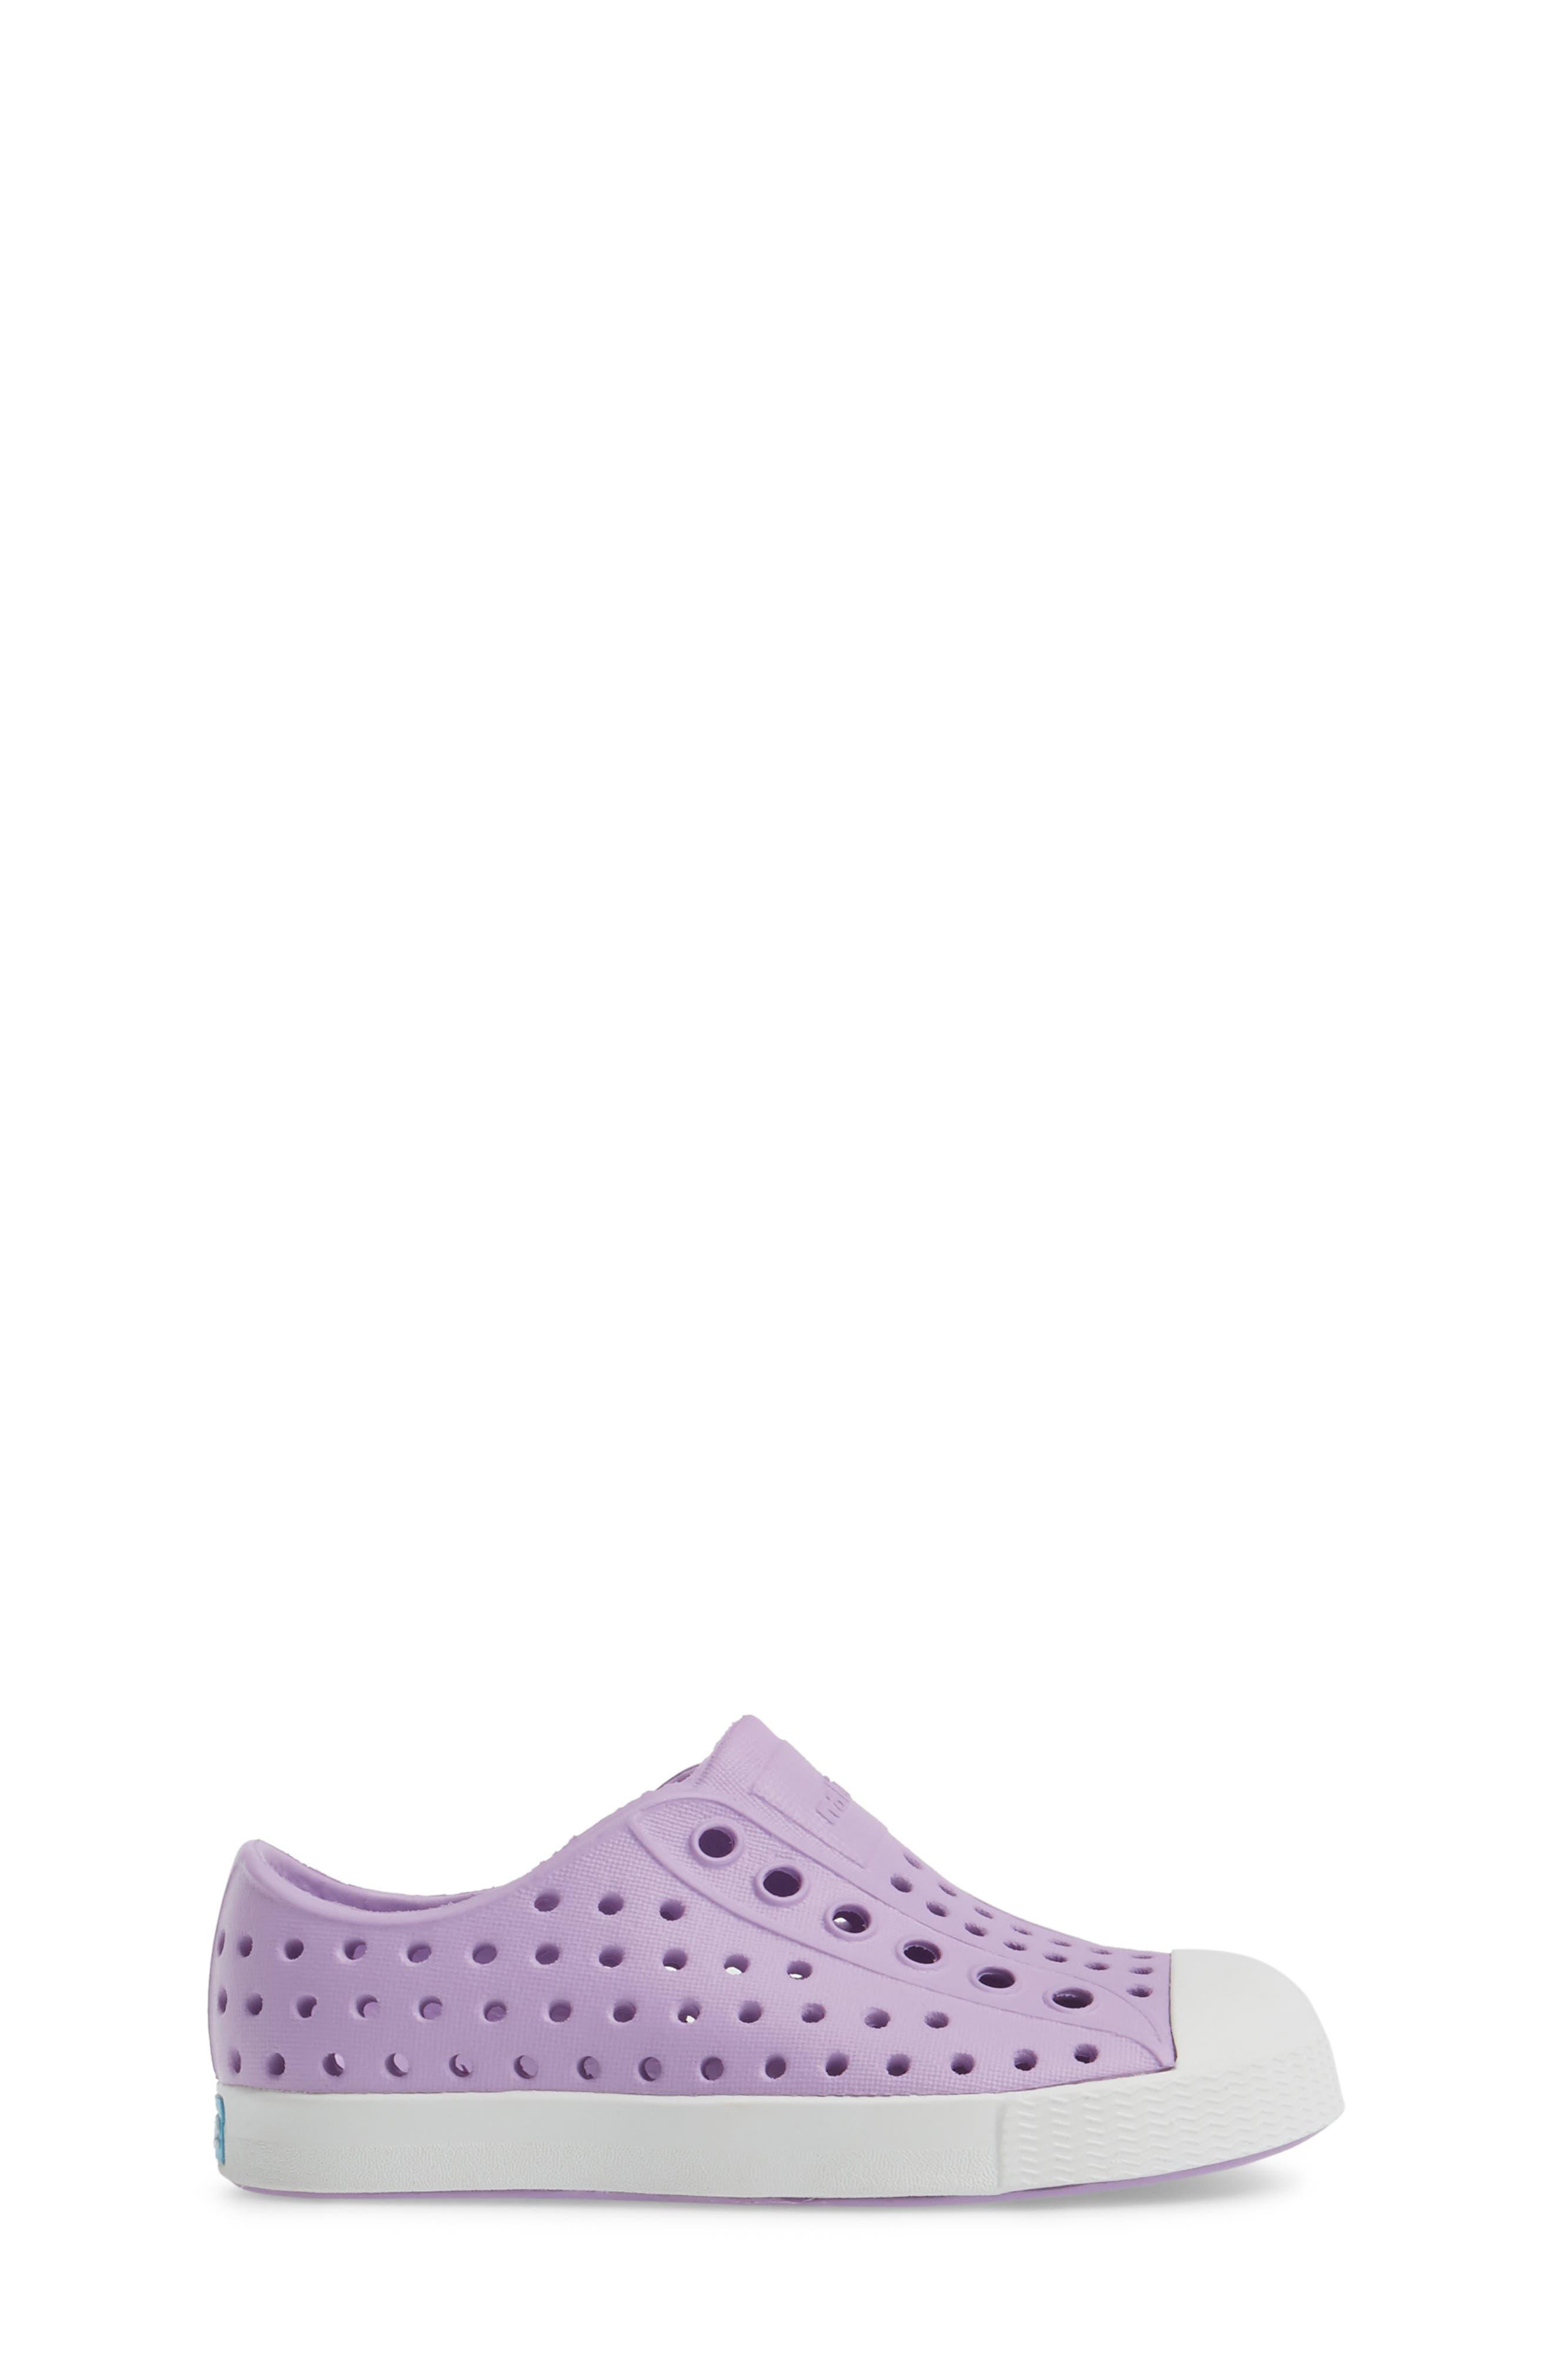 'Jefferson' Water Friendly Slip-On Sneaker,                             Alternate thumbnail 160, color,